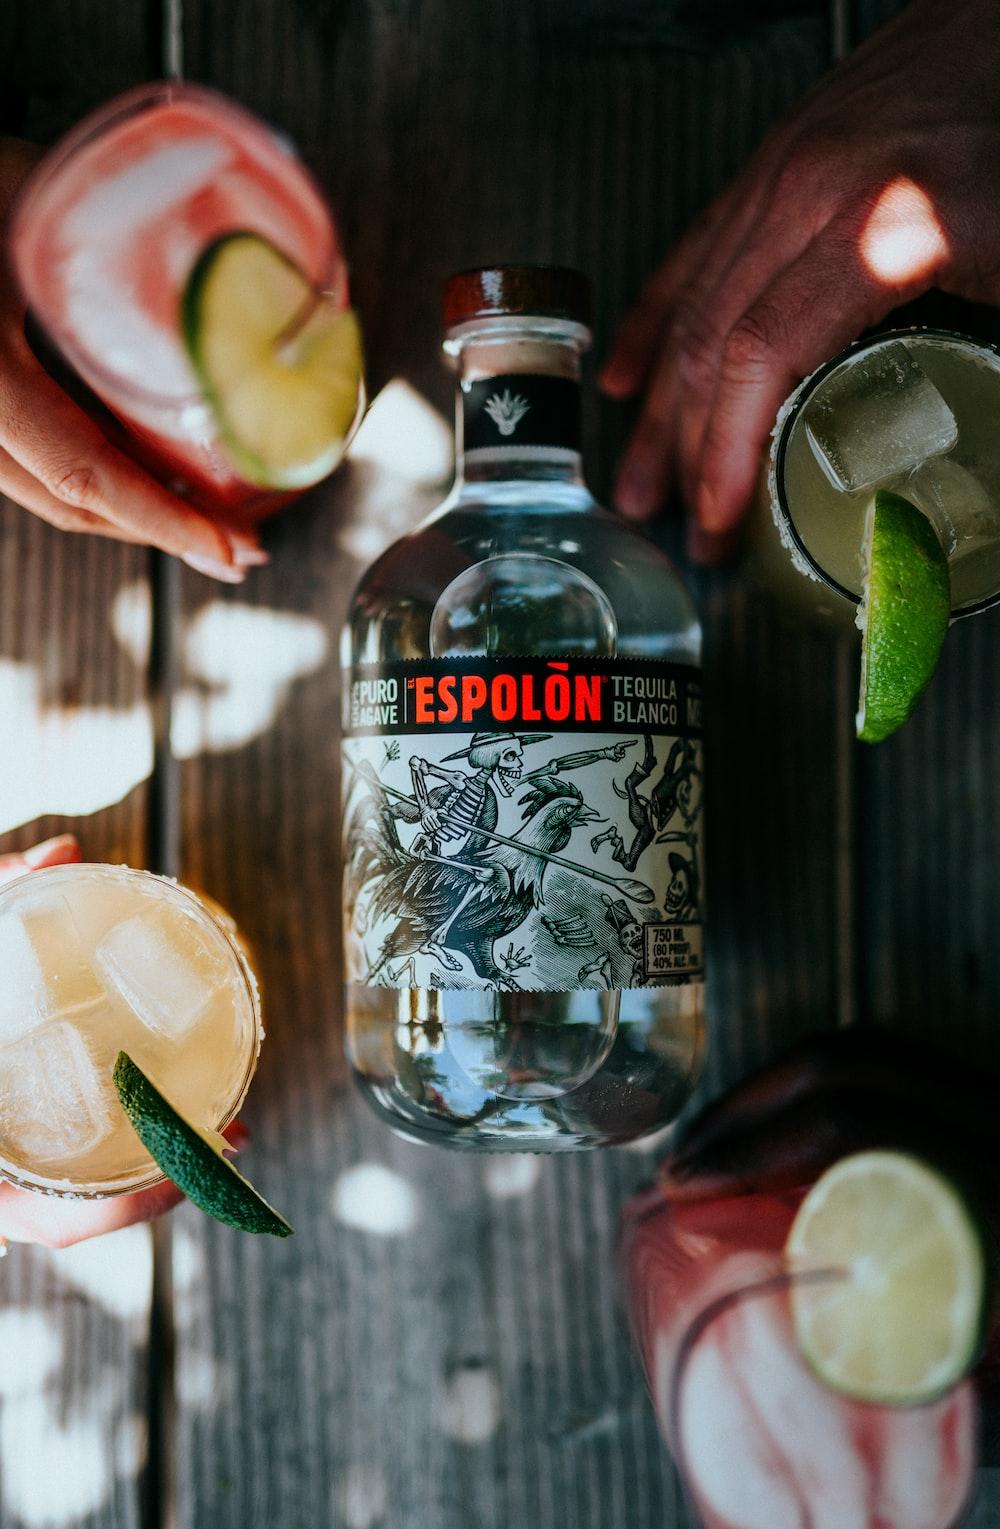 Espolòn Tequila bottle